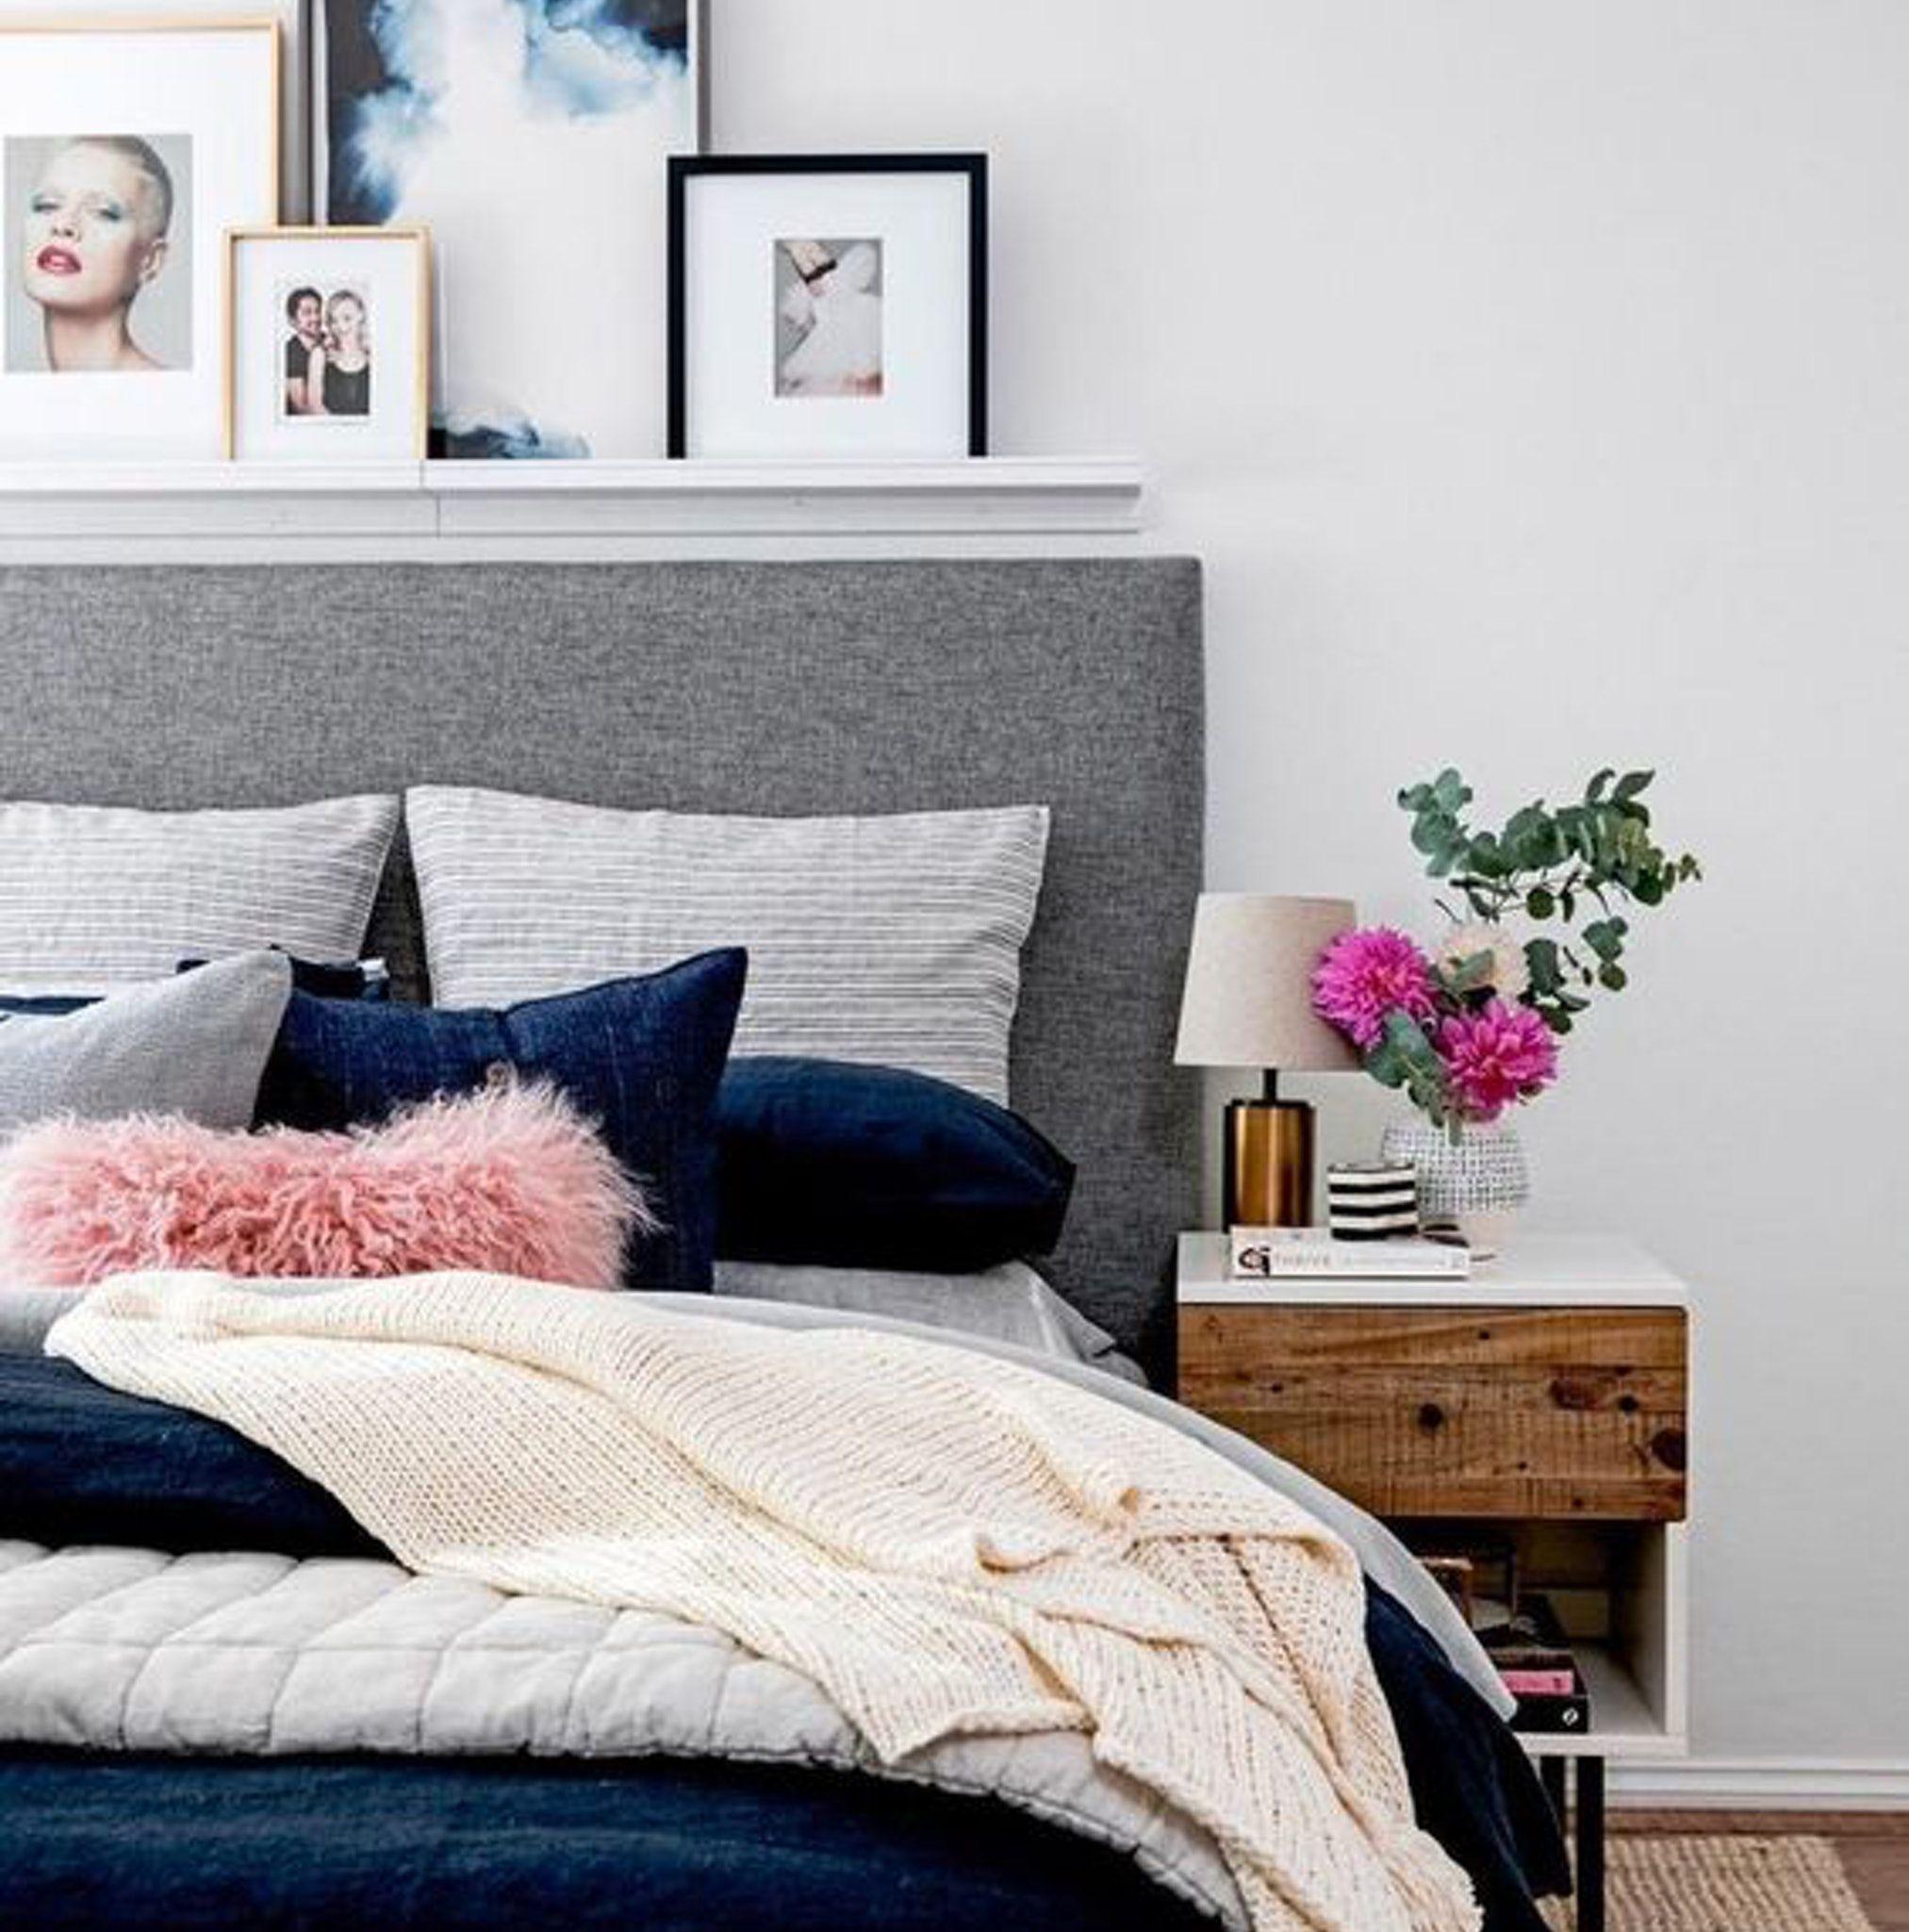 Attrayant Interior Design Style Quiz   Whatu0027s Your Decorating Style